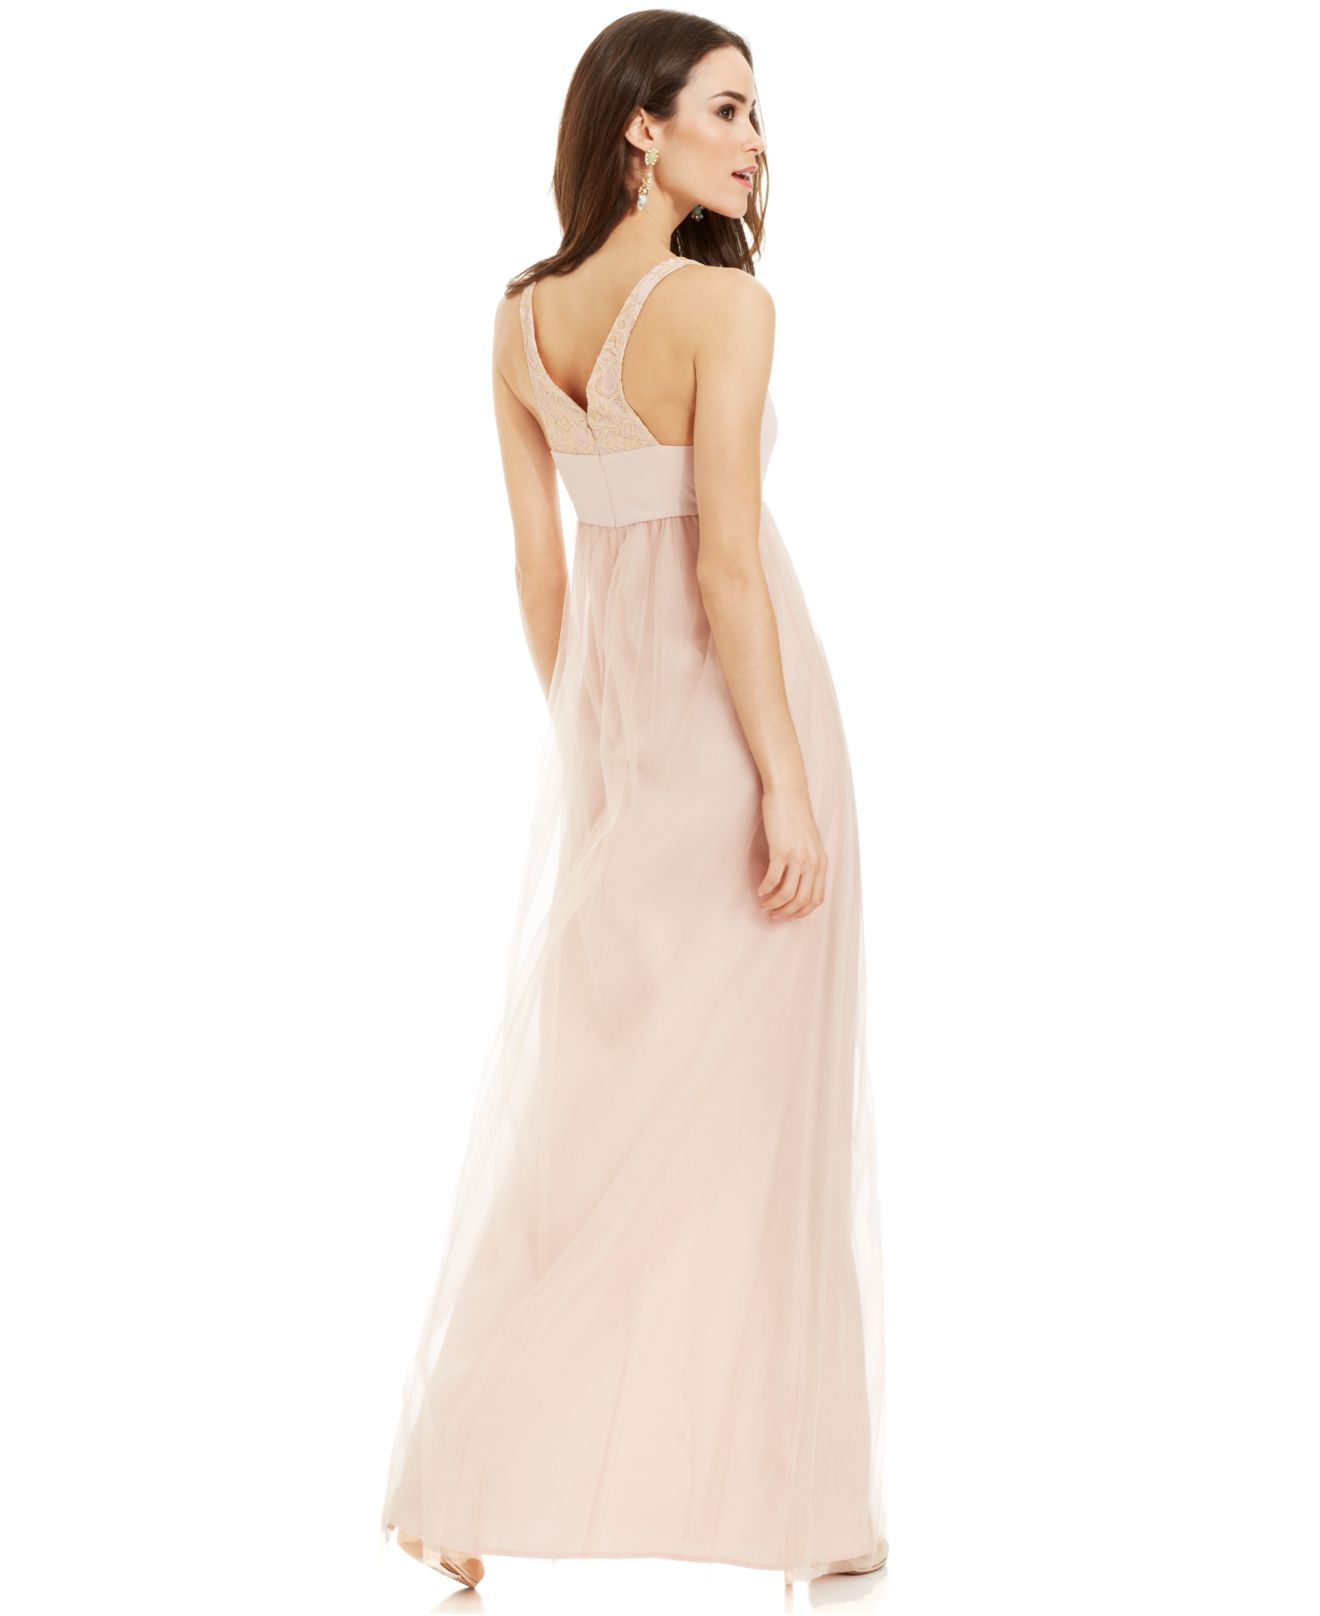 Blush Empire Waist Dresses